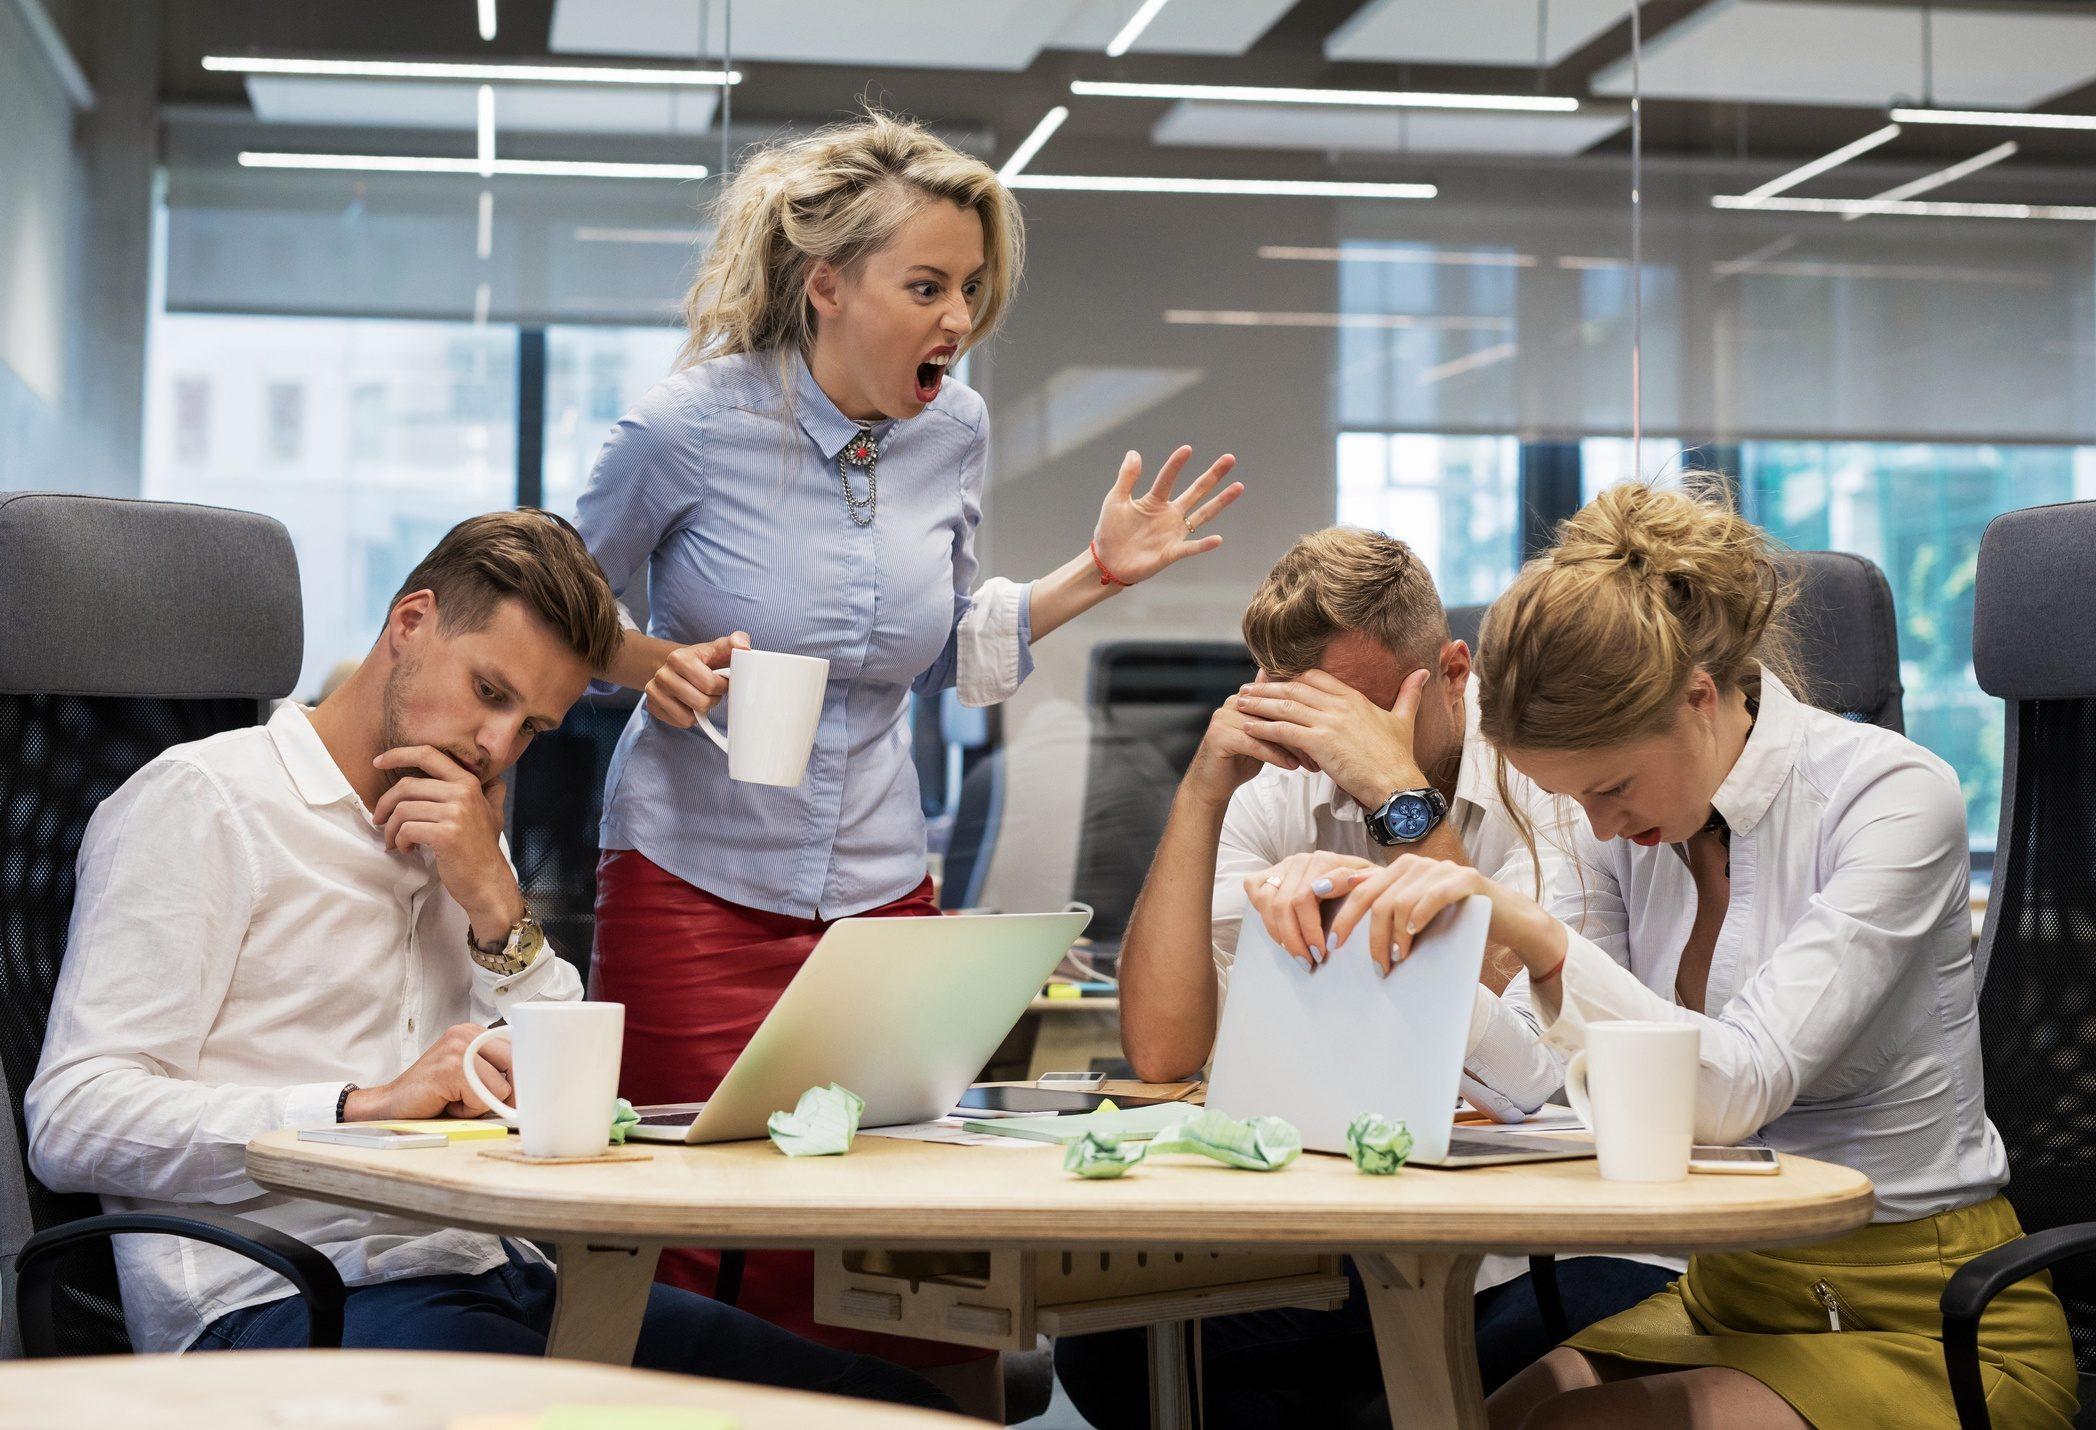 bad boss traits -- yelling, emotional, abusive